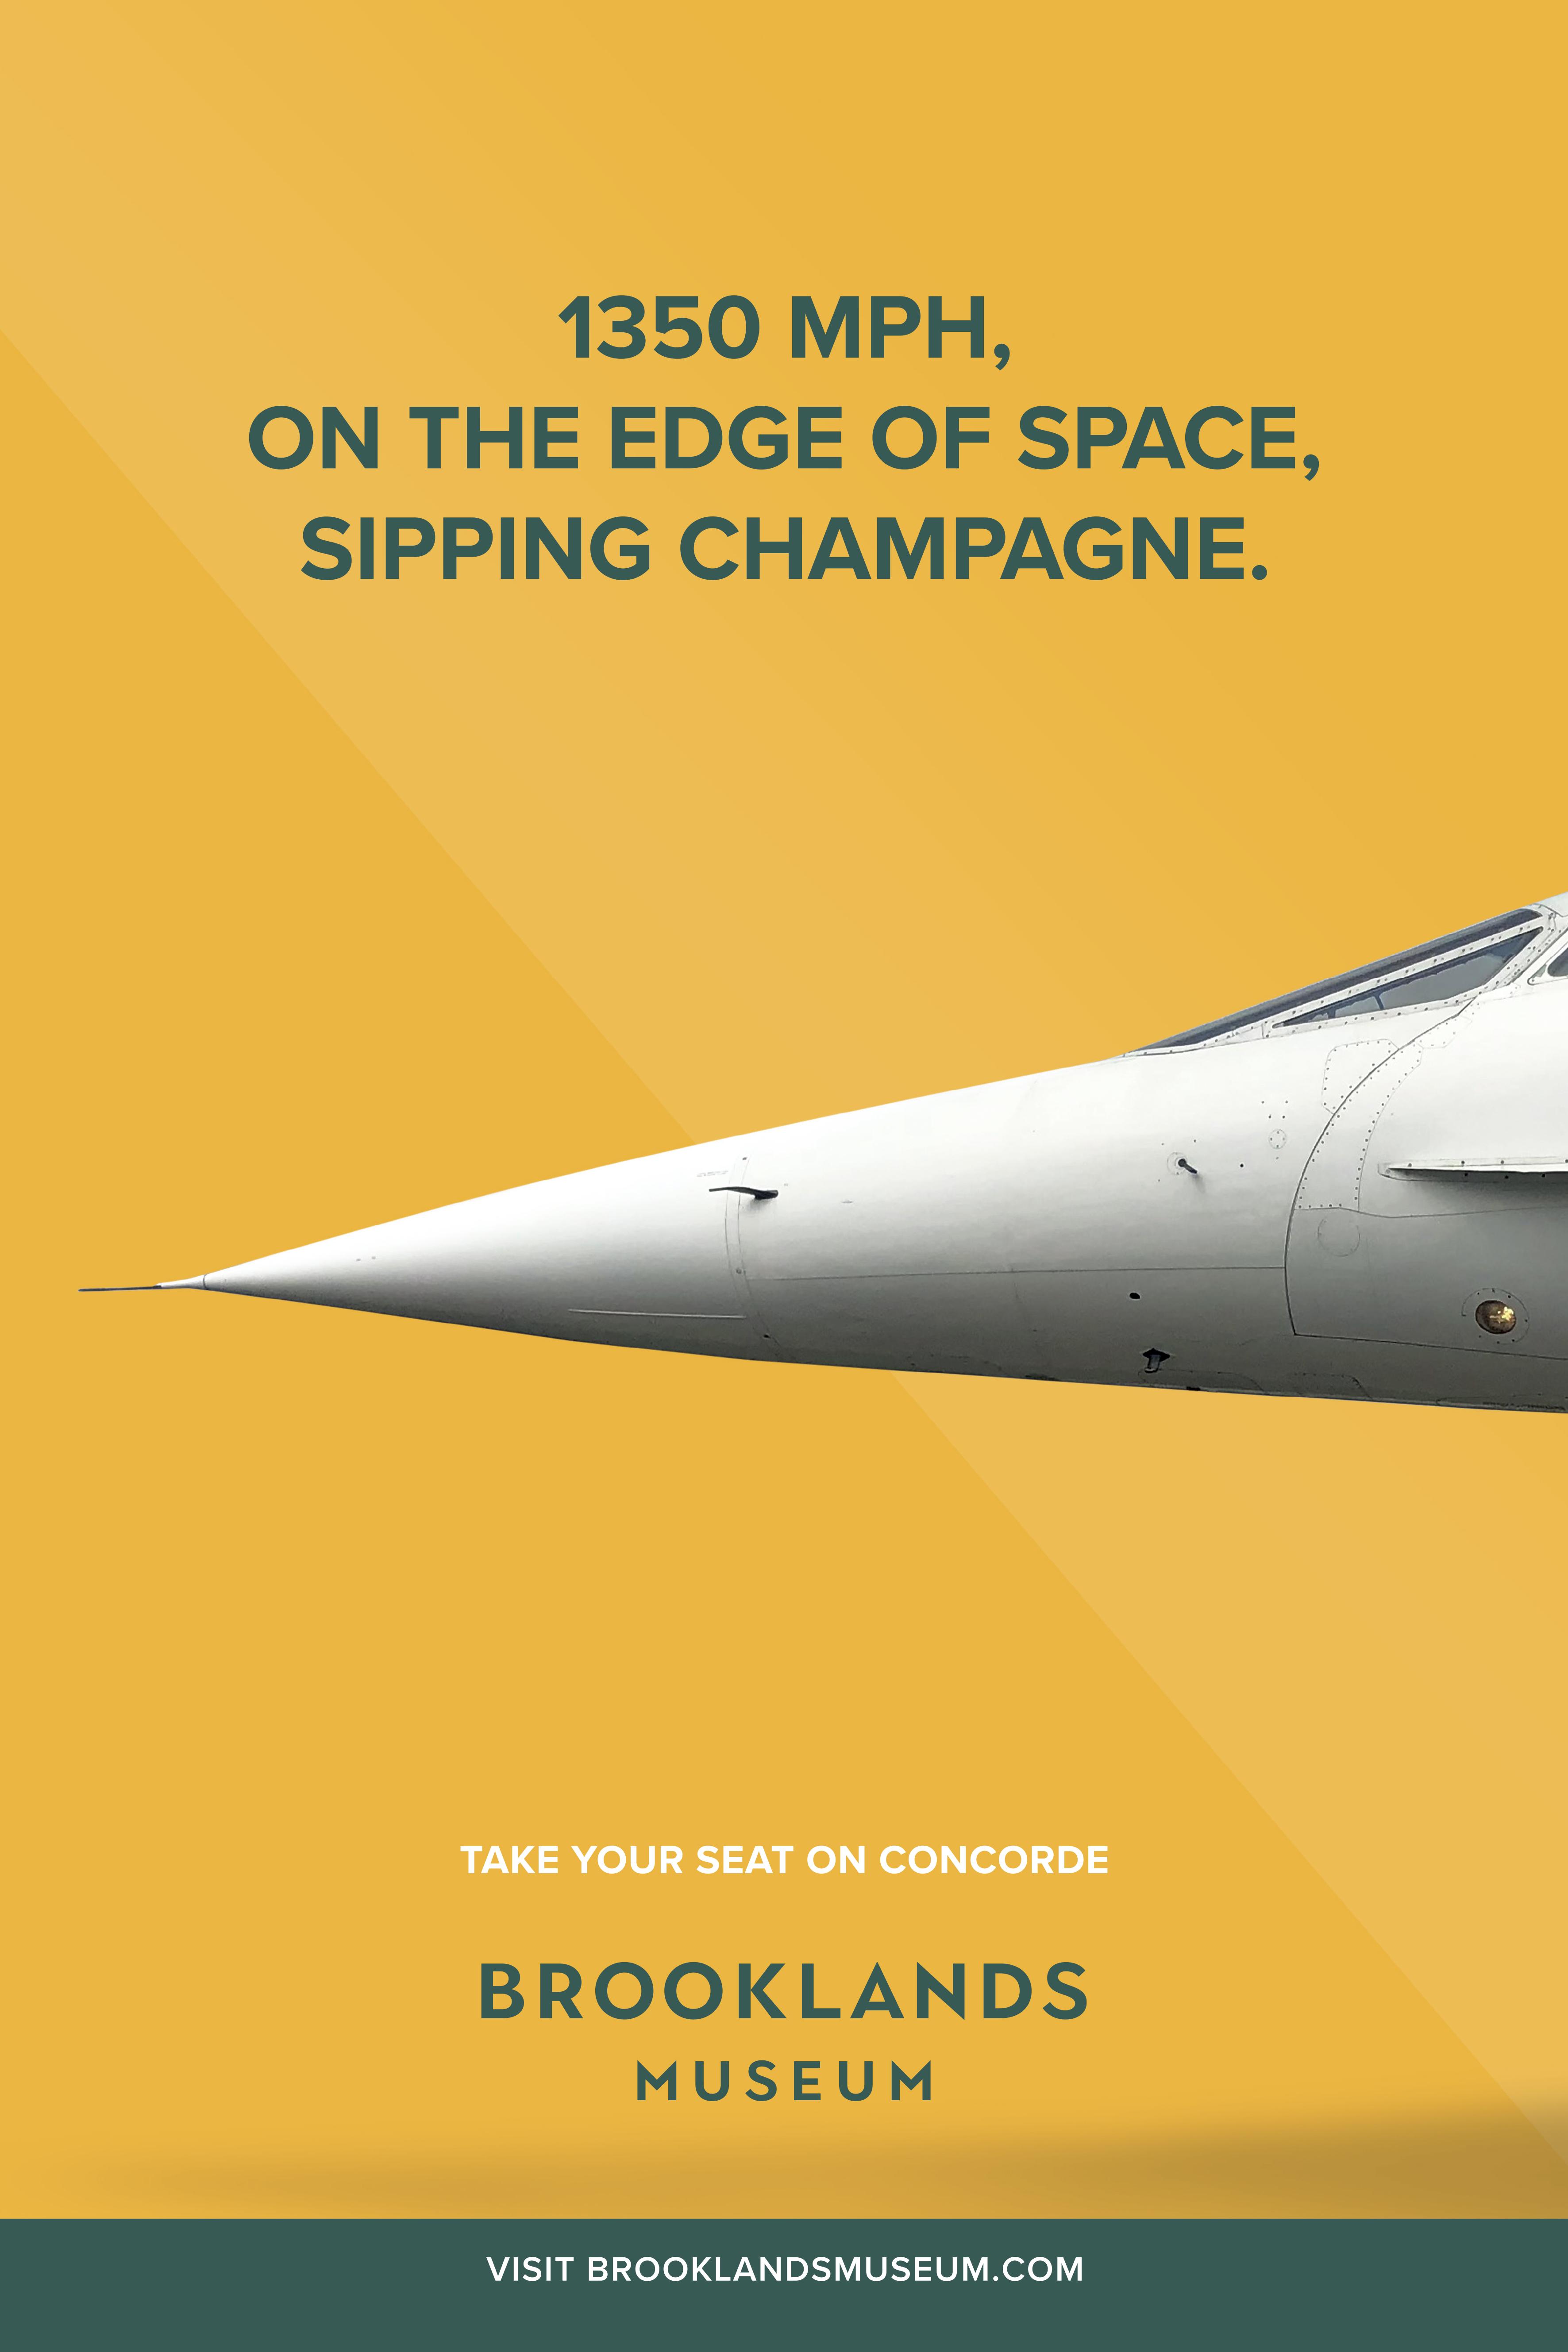 Brooklands brand campaign poster_6sht_350x440mm_quartersize_v2_outlined_Concorde_AW